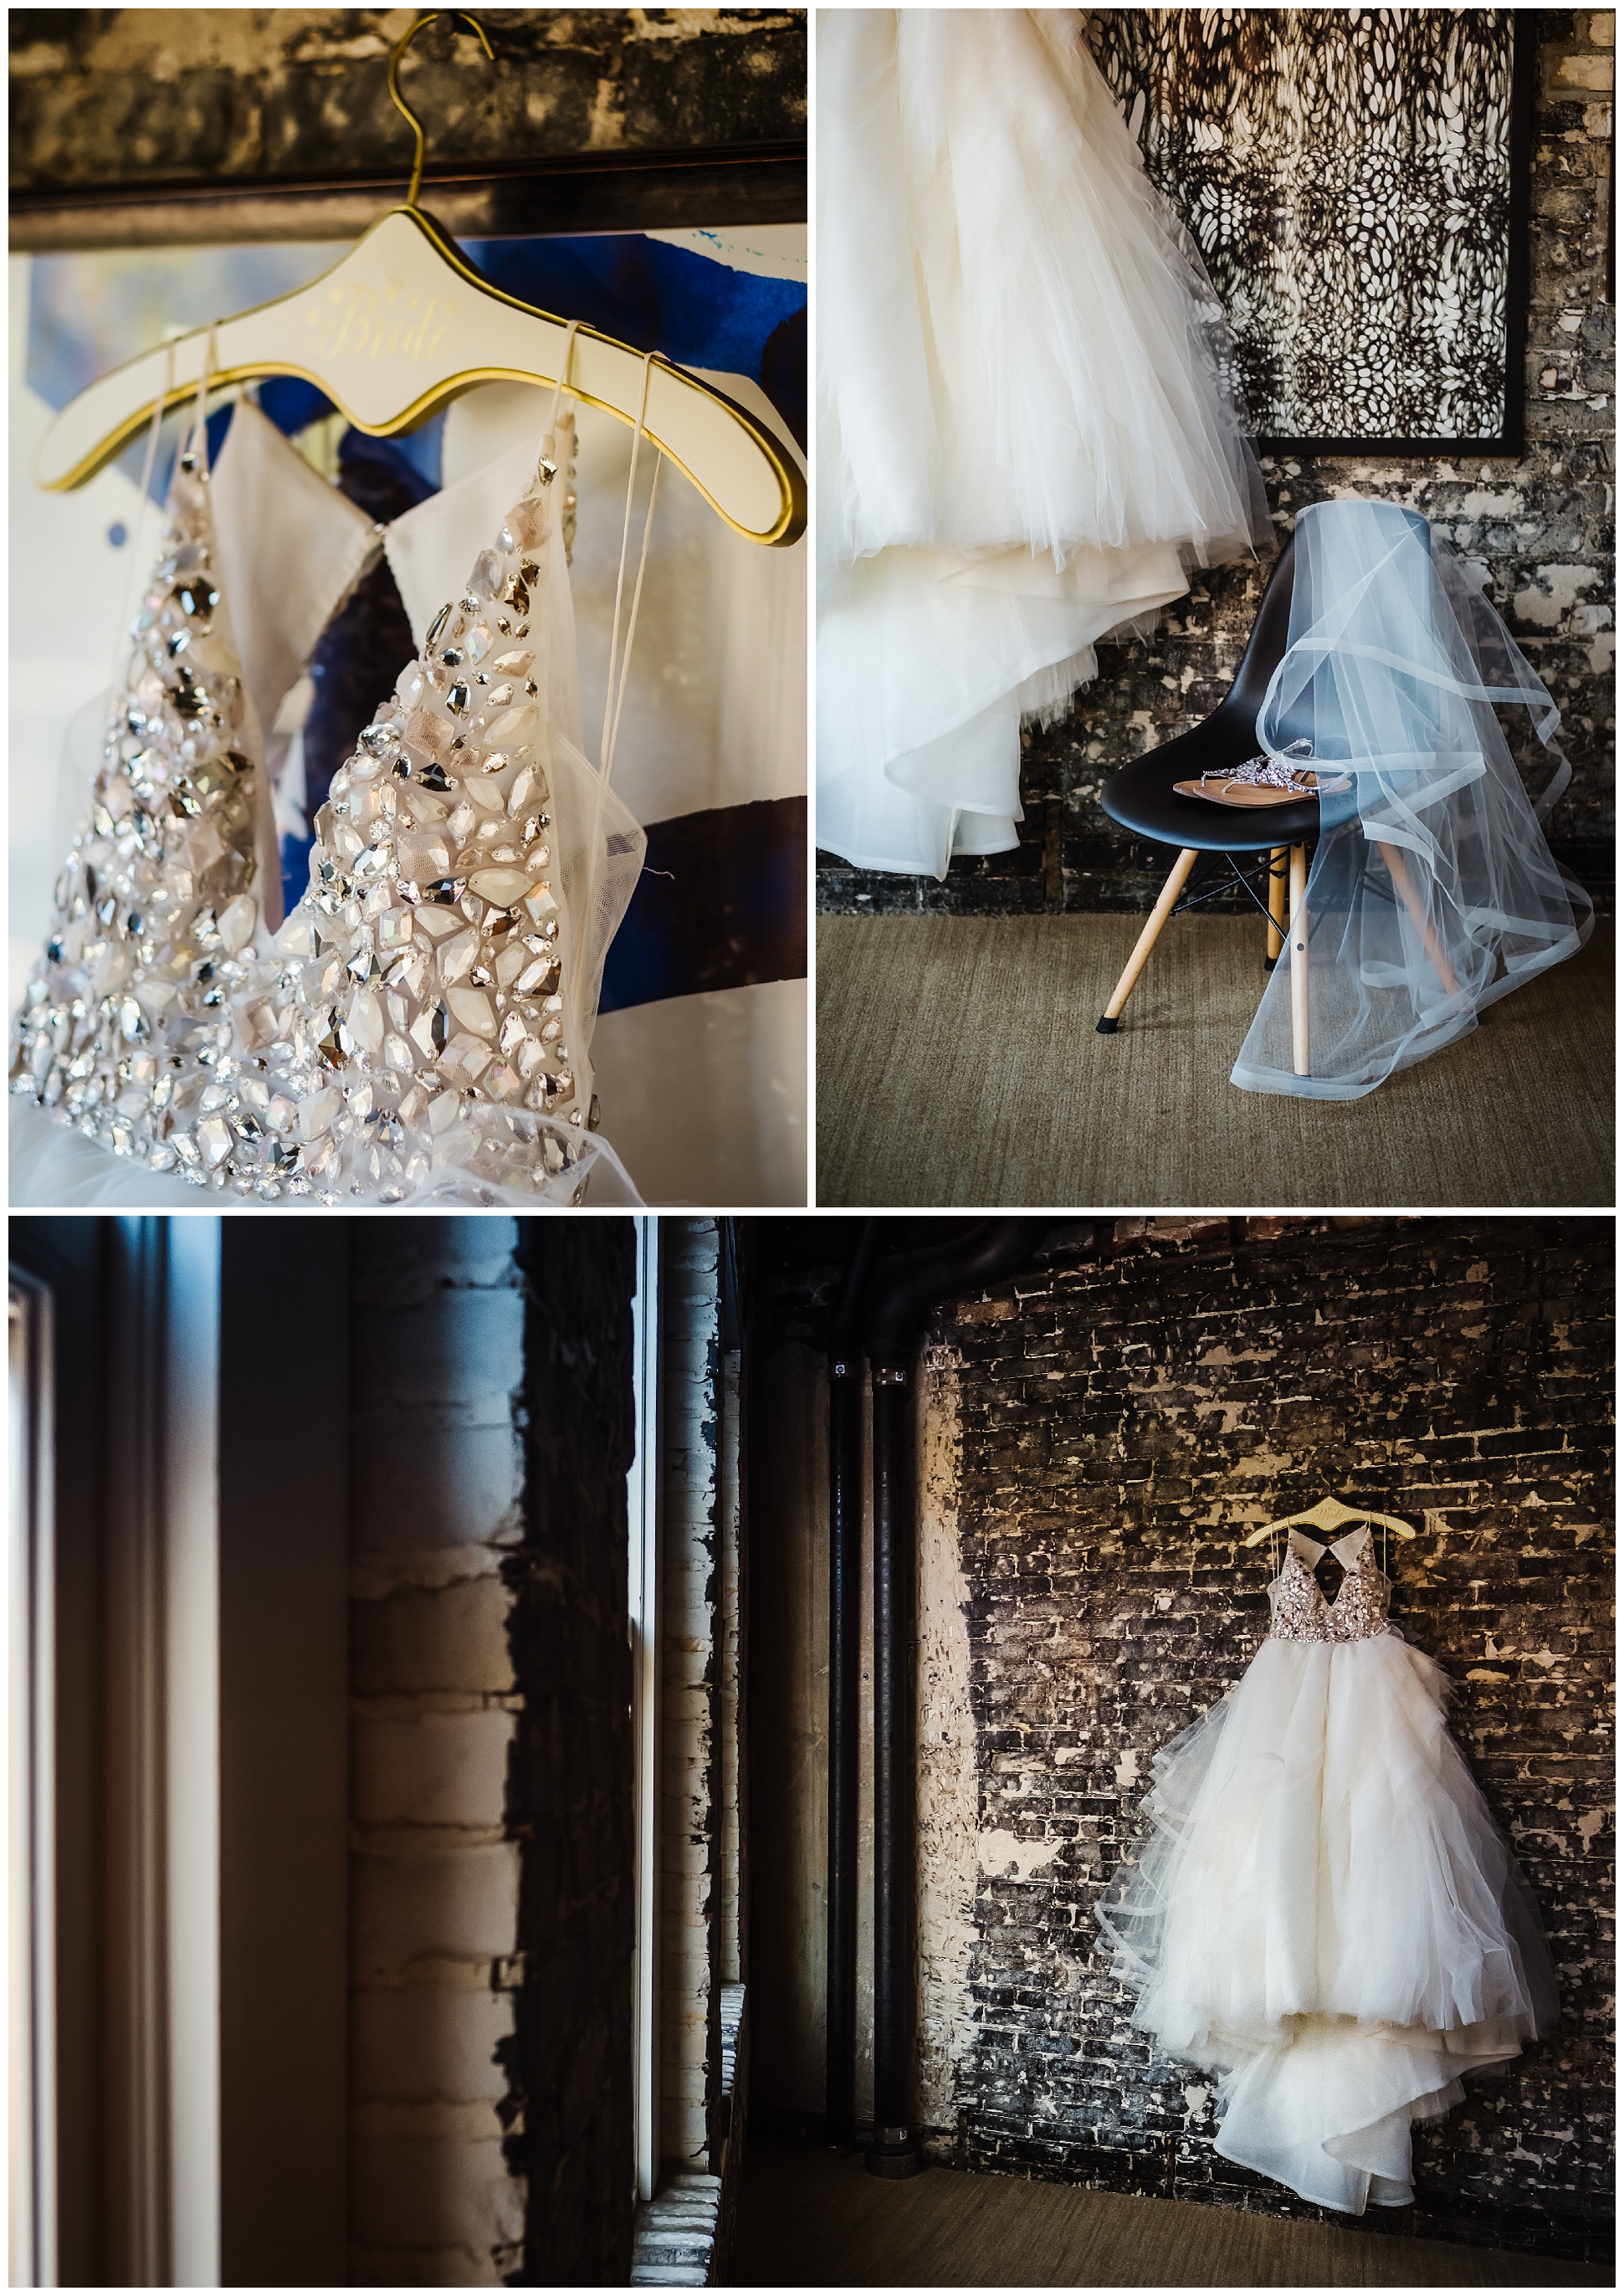 tampa-wedding-photographer-oxford-exchange-garland-candlelight-gold-hayley-paige_0003.jpg